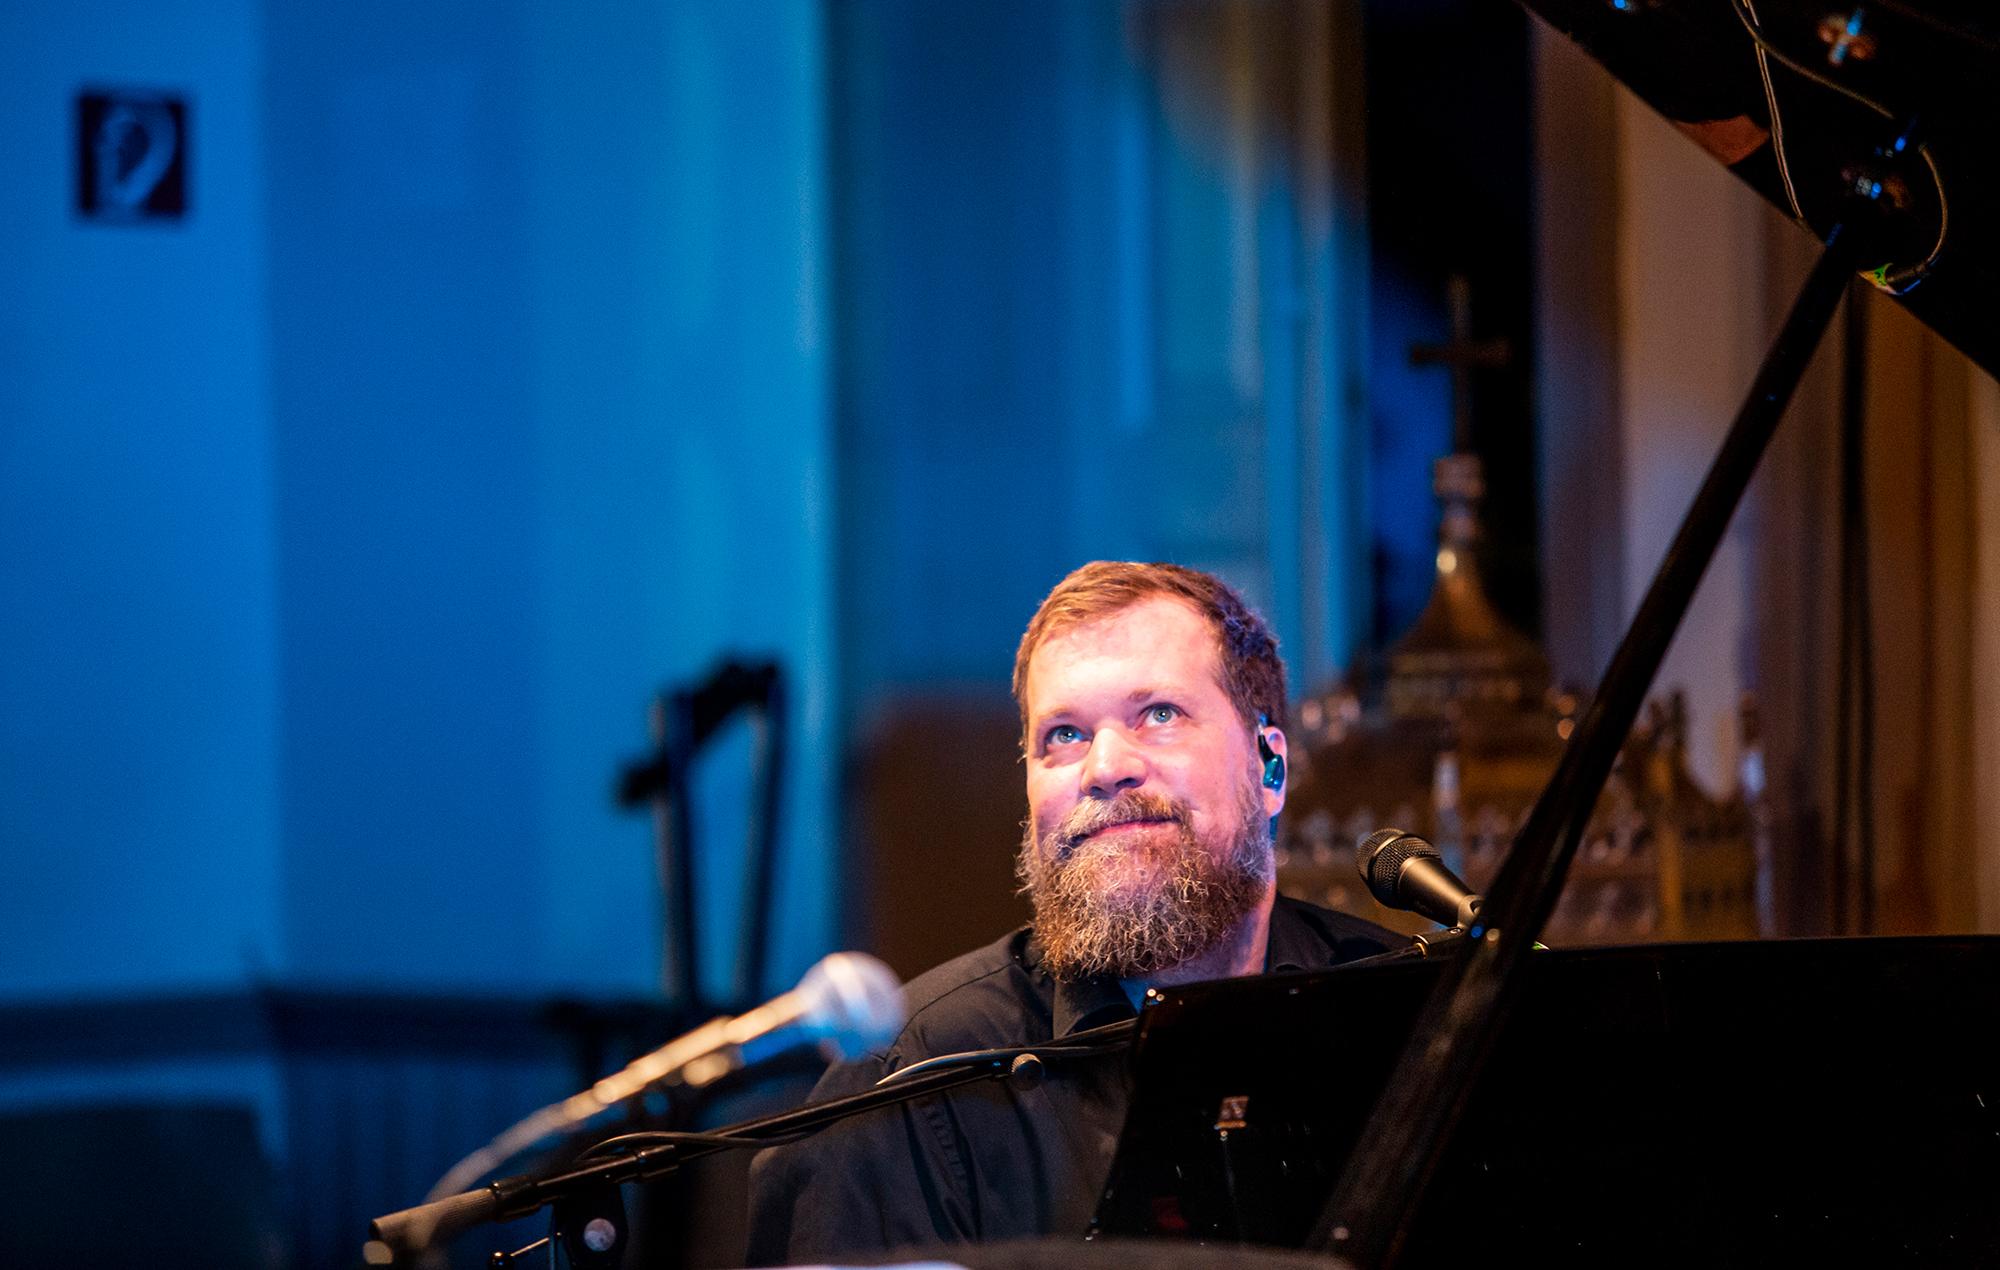 John Grant at Iceland Airwaves